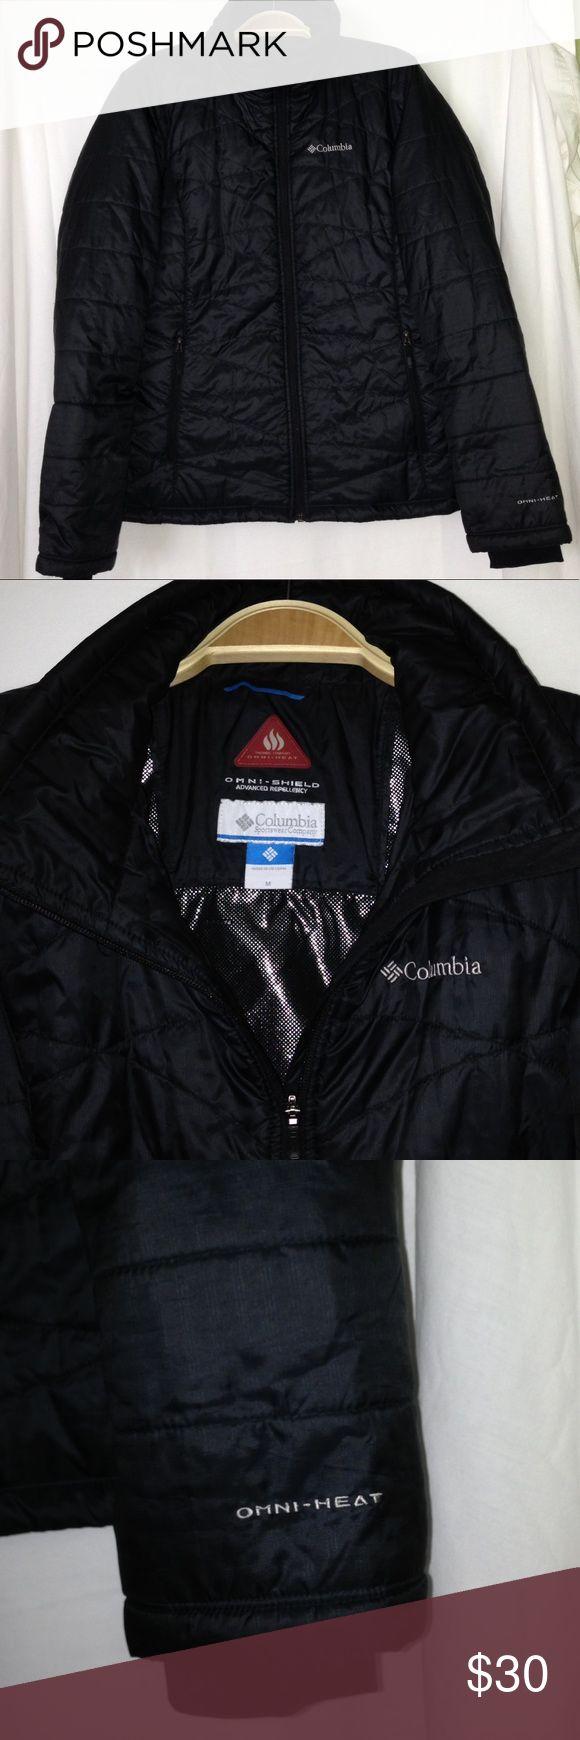 Columbia omni heat jacket. Size M. Columbia omney heat jacket. Size M. In good shape. Columbia Jackets & Coats